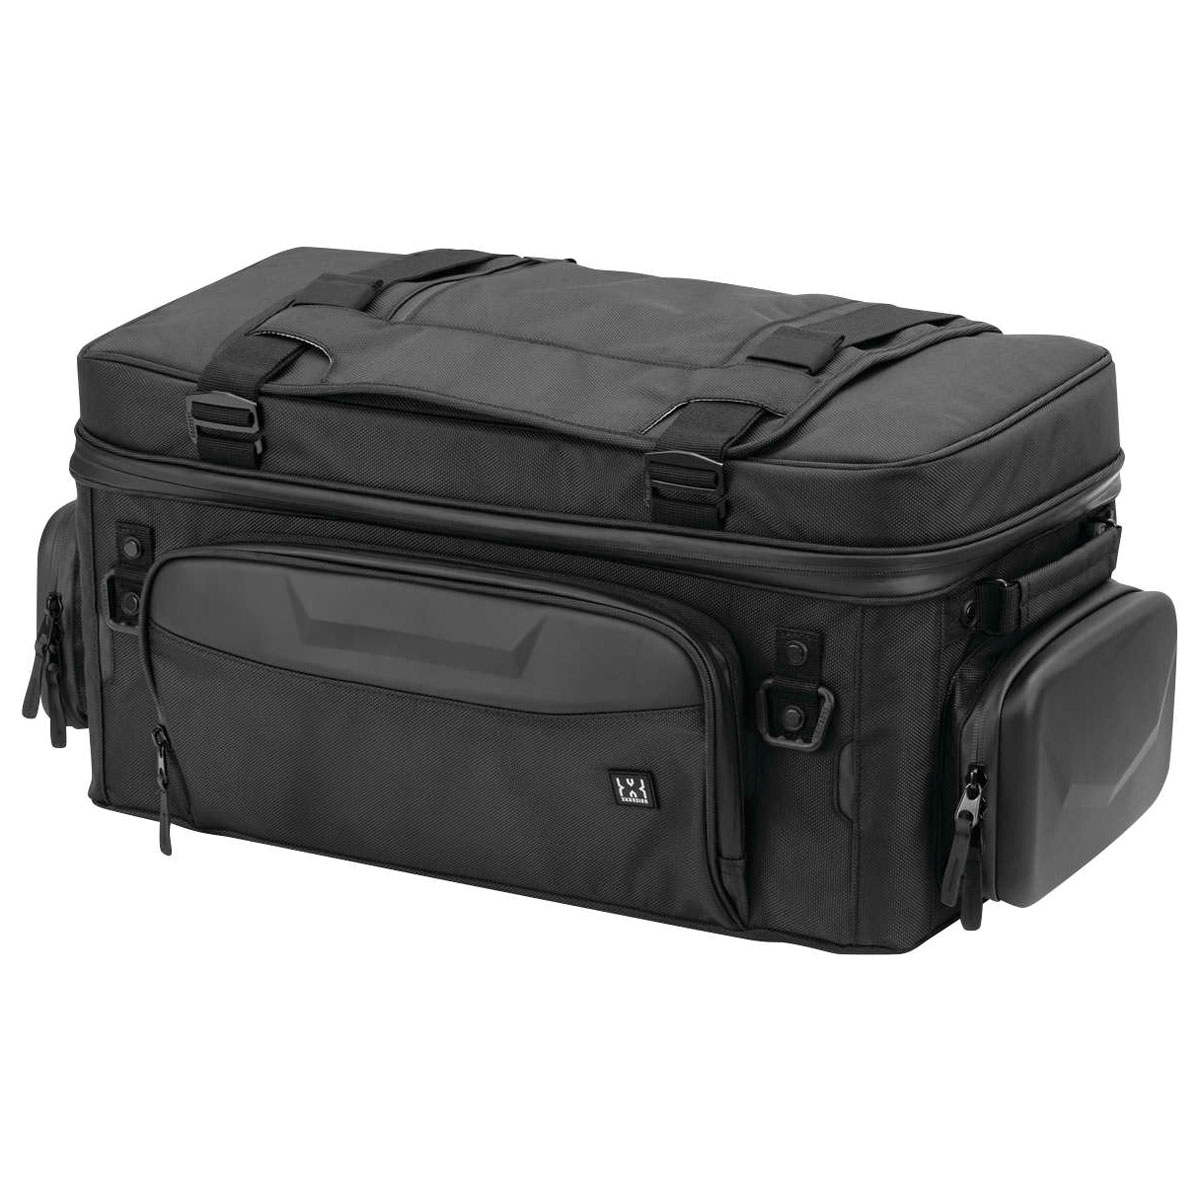 Kuryakyn Xkursion XS Guardian Rack Bag